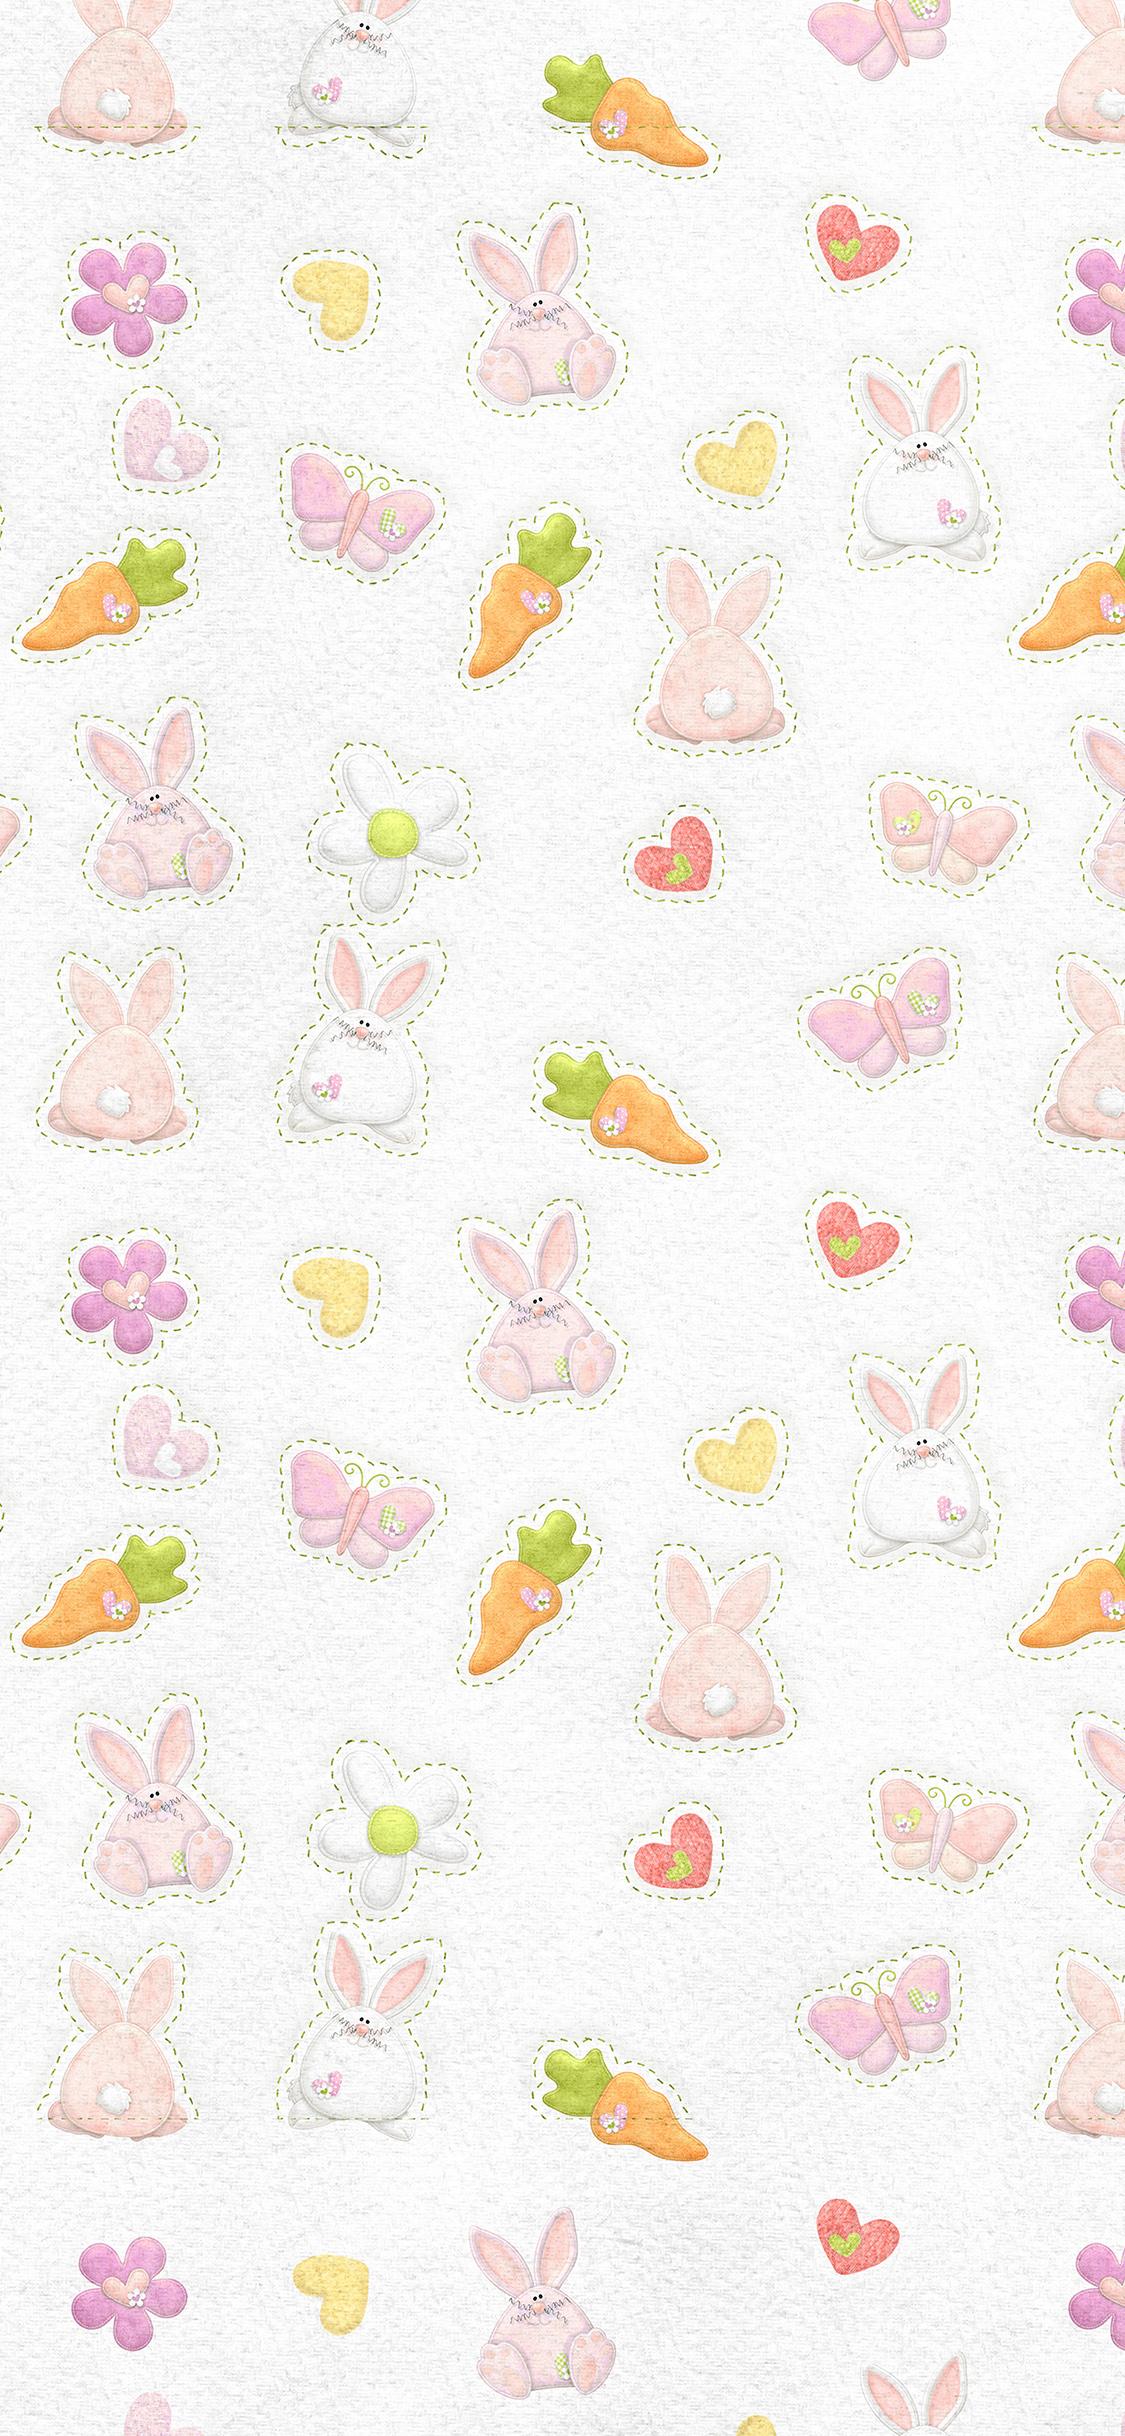 iPhoneXpapers.com-Apple-iPhone-wallpaper-vp05-cute-rabbit-chracter-pattern